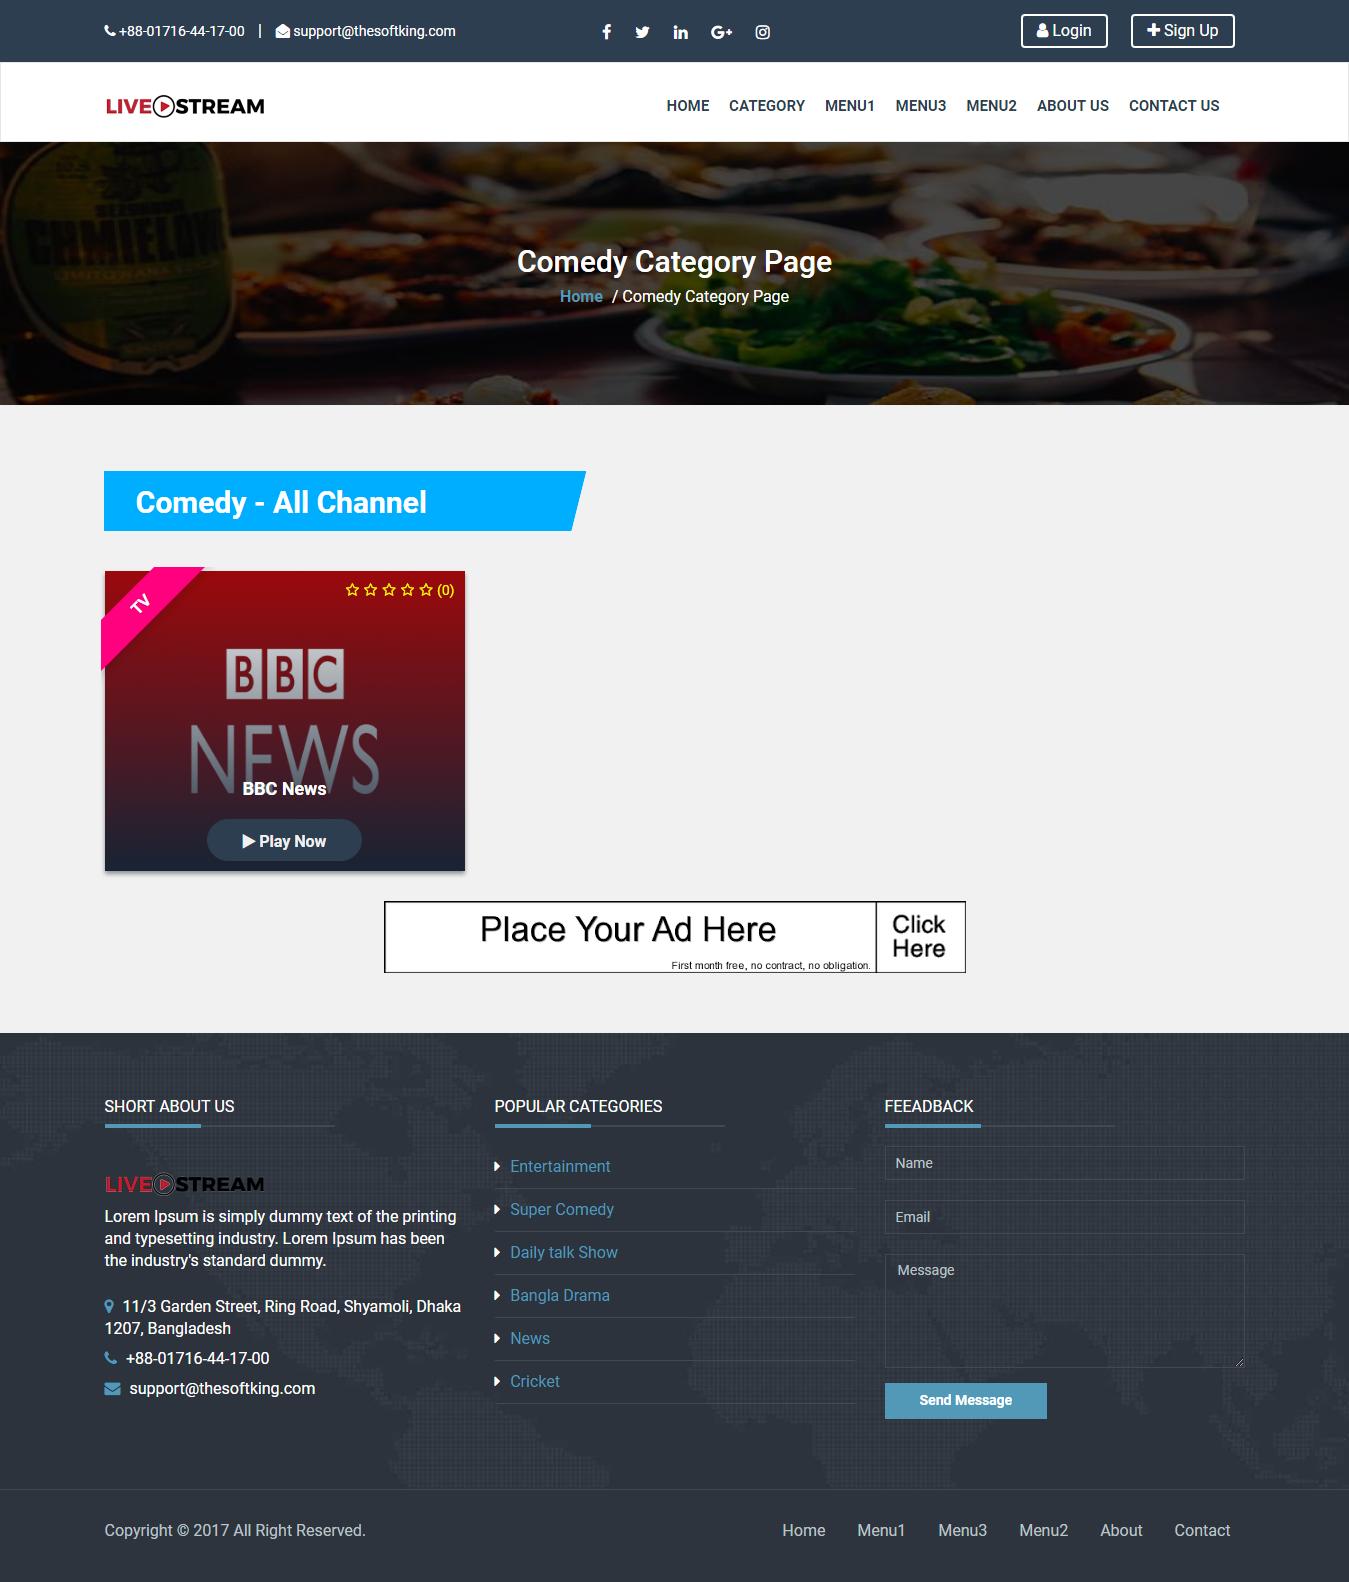 LetsPlay - Live TV Streaming & Radio Channel Listing